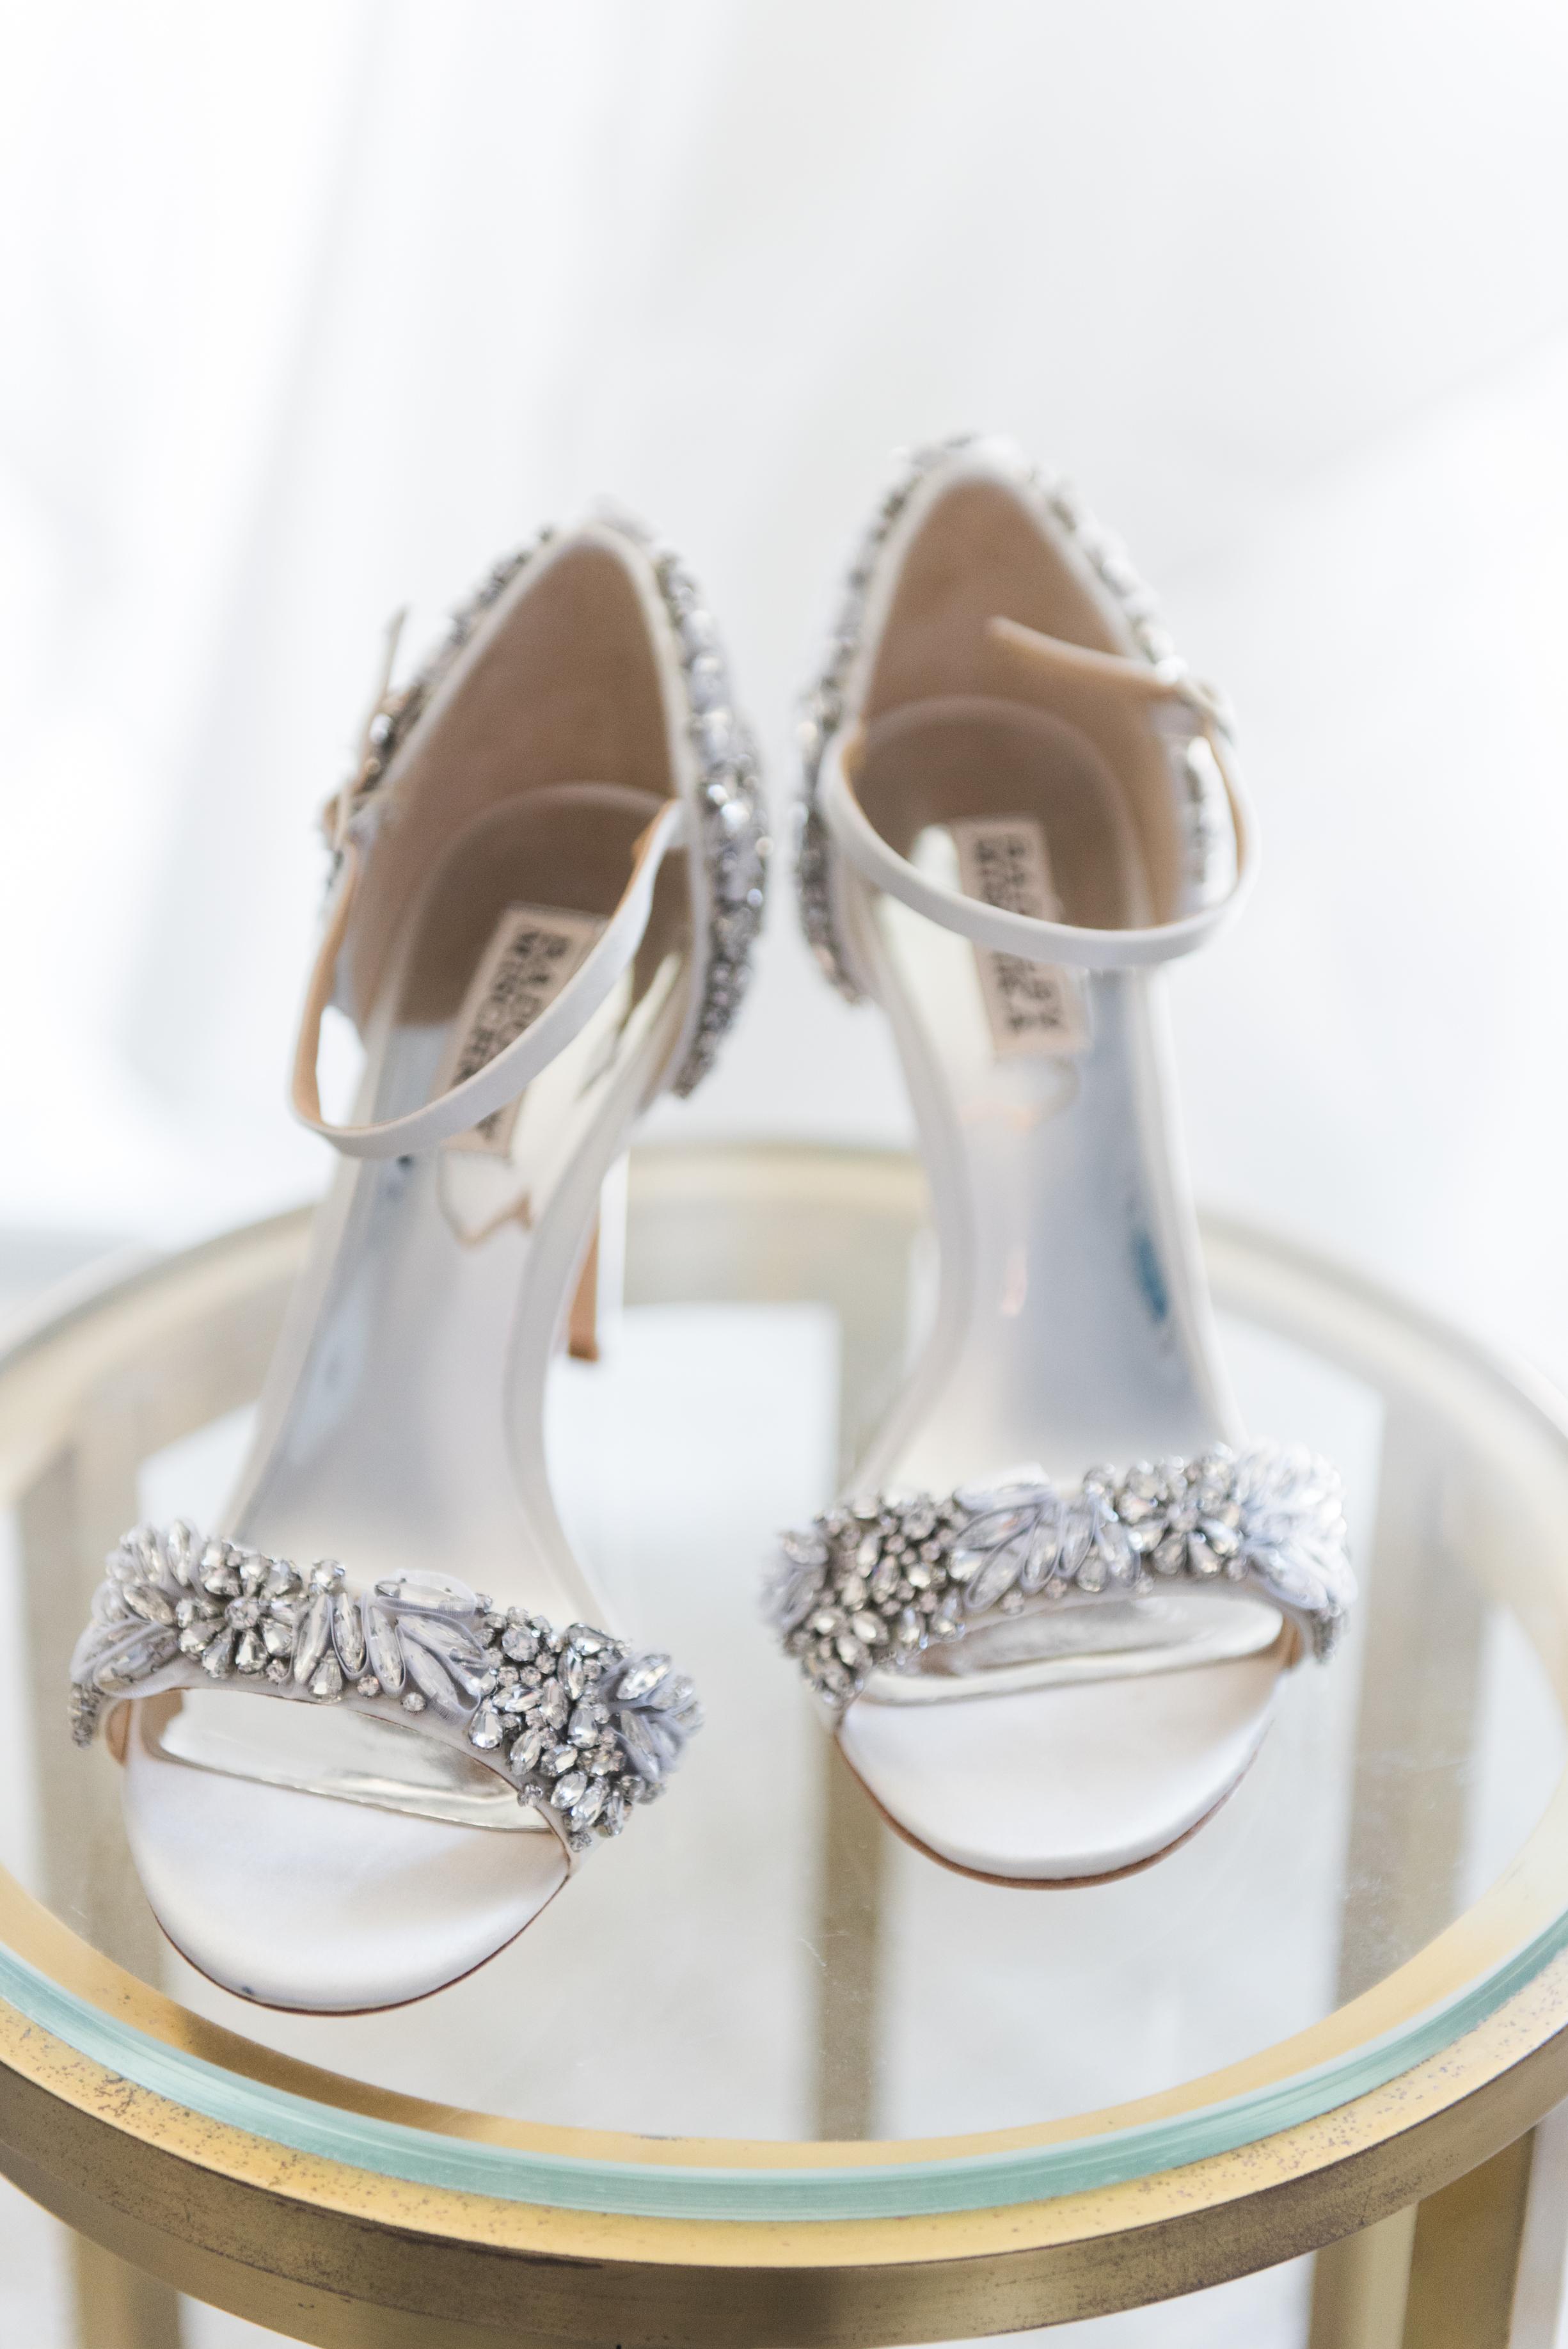 Gorgeous Silver Wedding Shoes - Flagler Museum Palm Beach Wedding Venue - The Overwhelmed Bride Wedding Blog